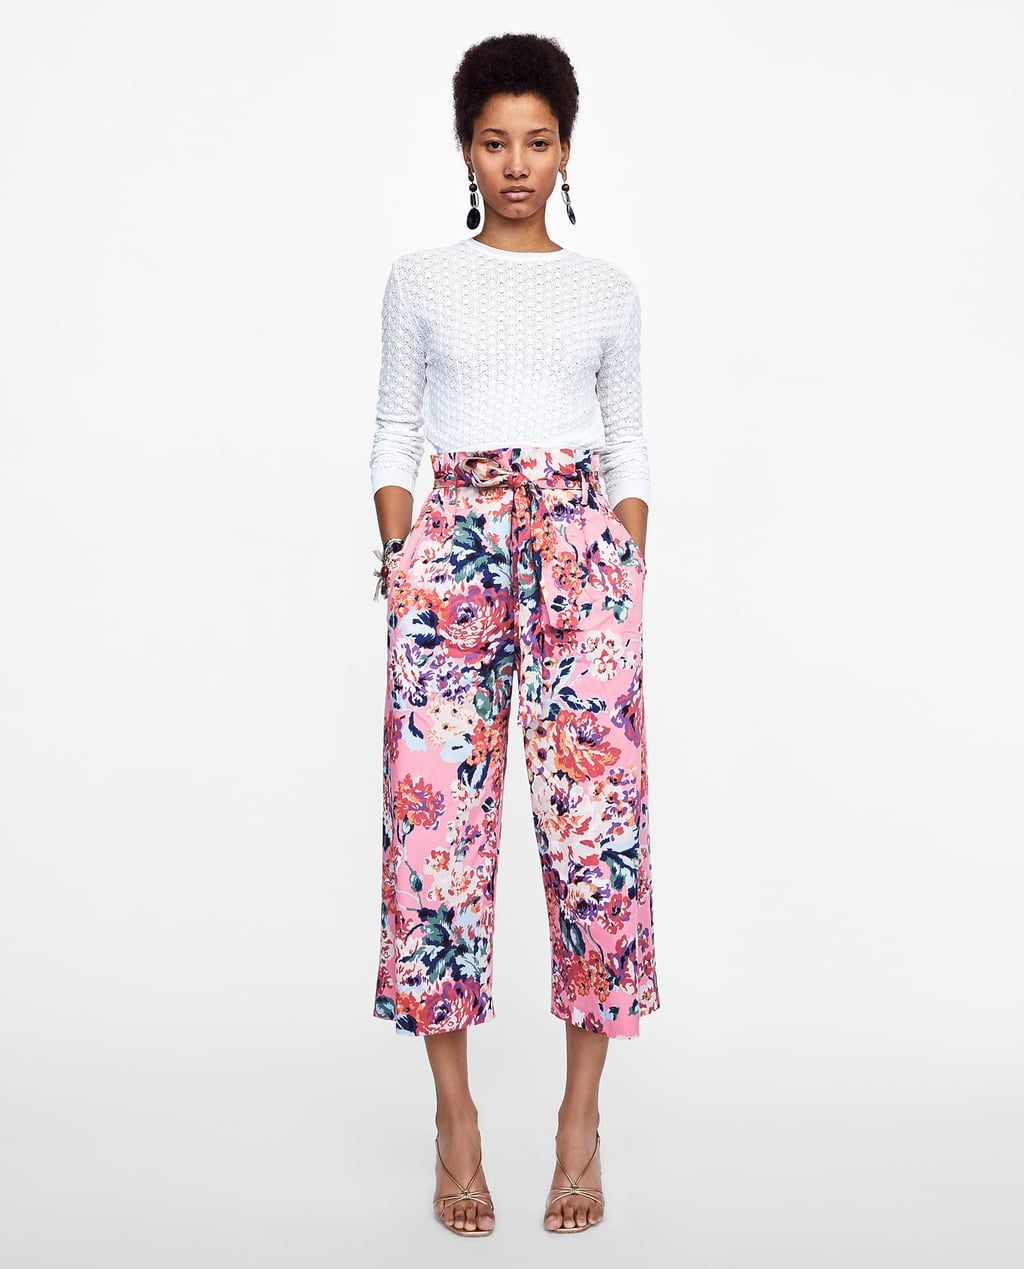 Pantalon Estampado Floral Cinturon